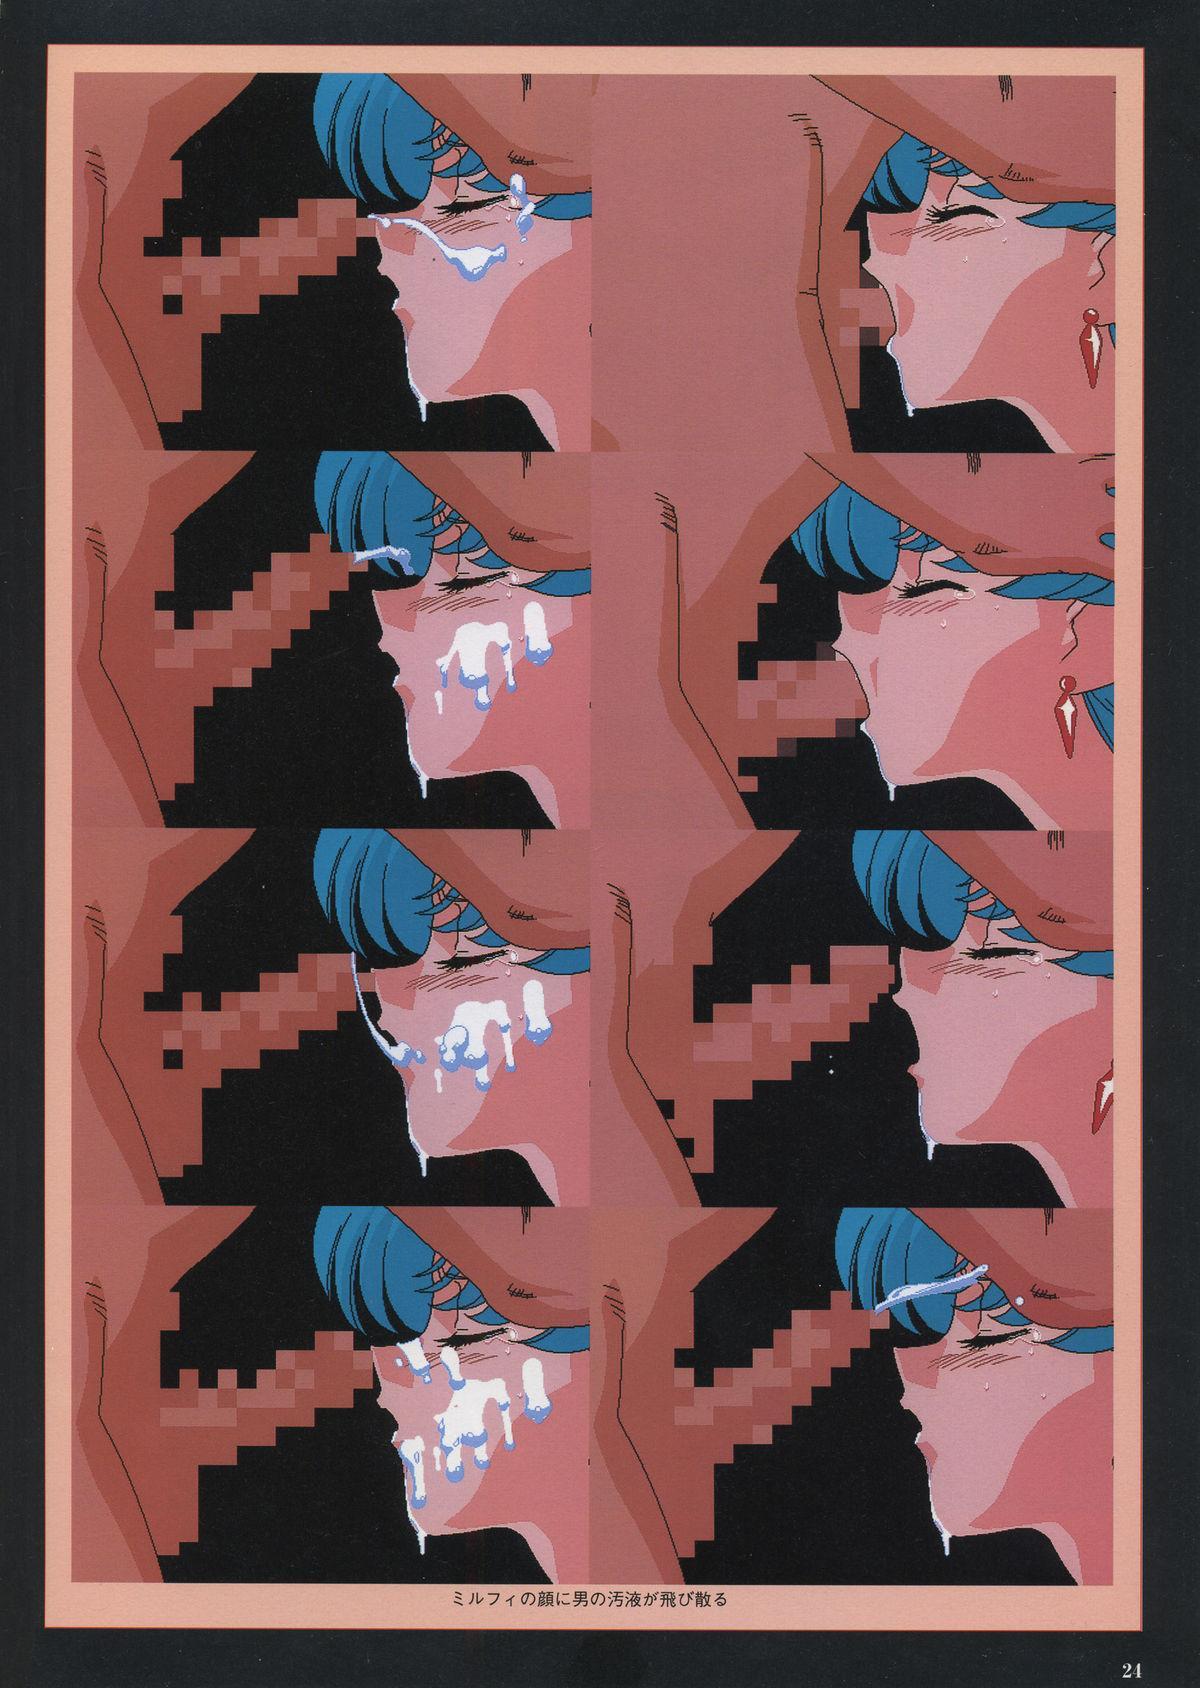 VIPER Series Official Artbook III 26